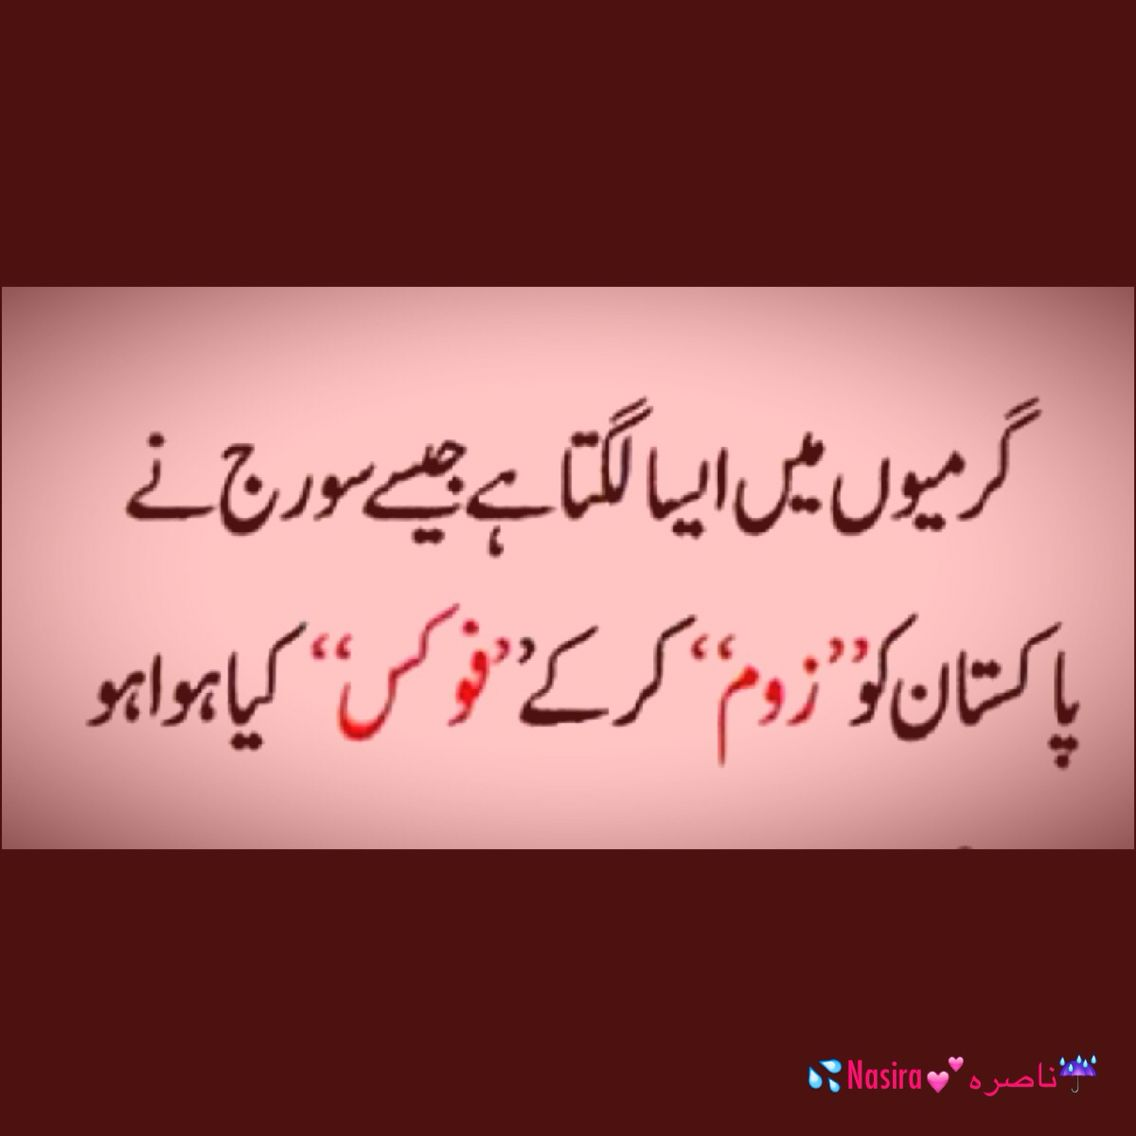 Best Funny Quotes Ever In Urdu